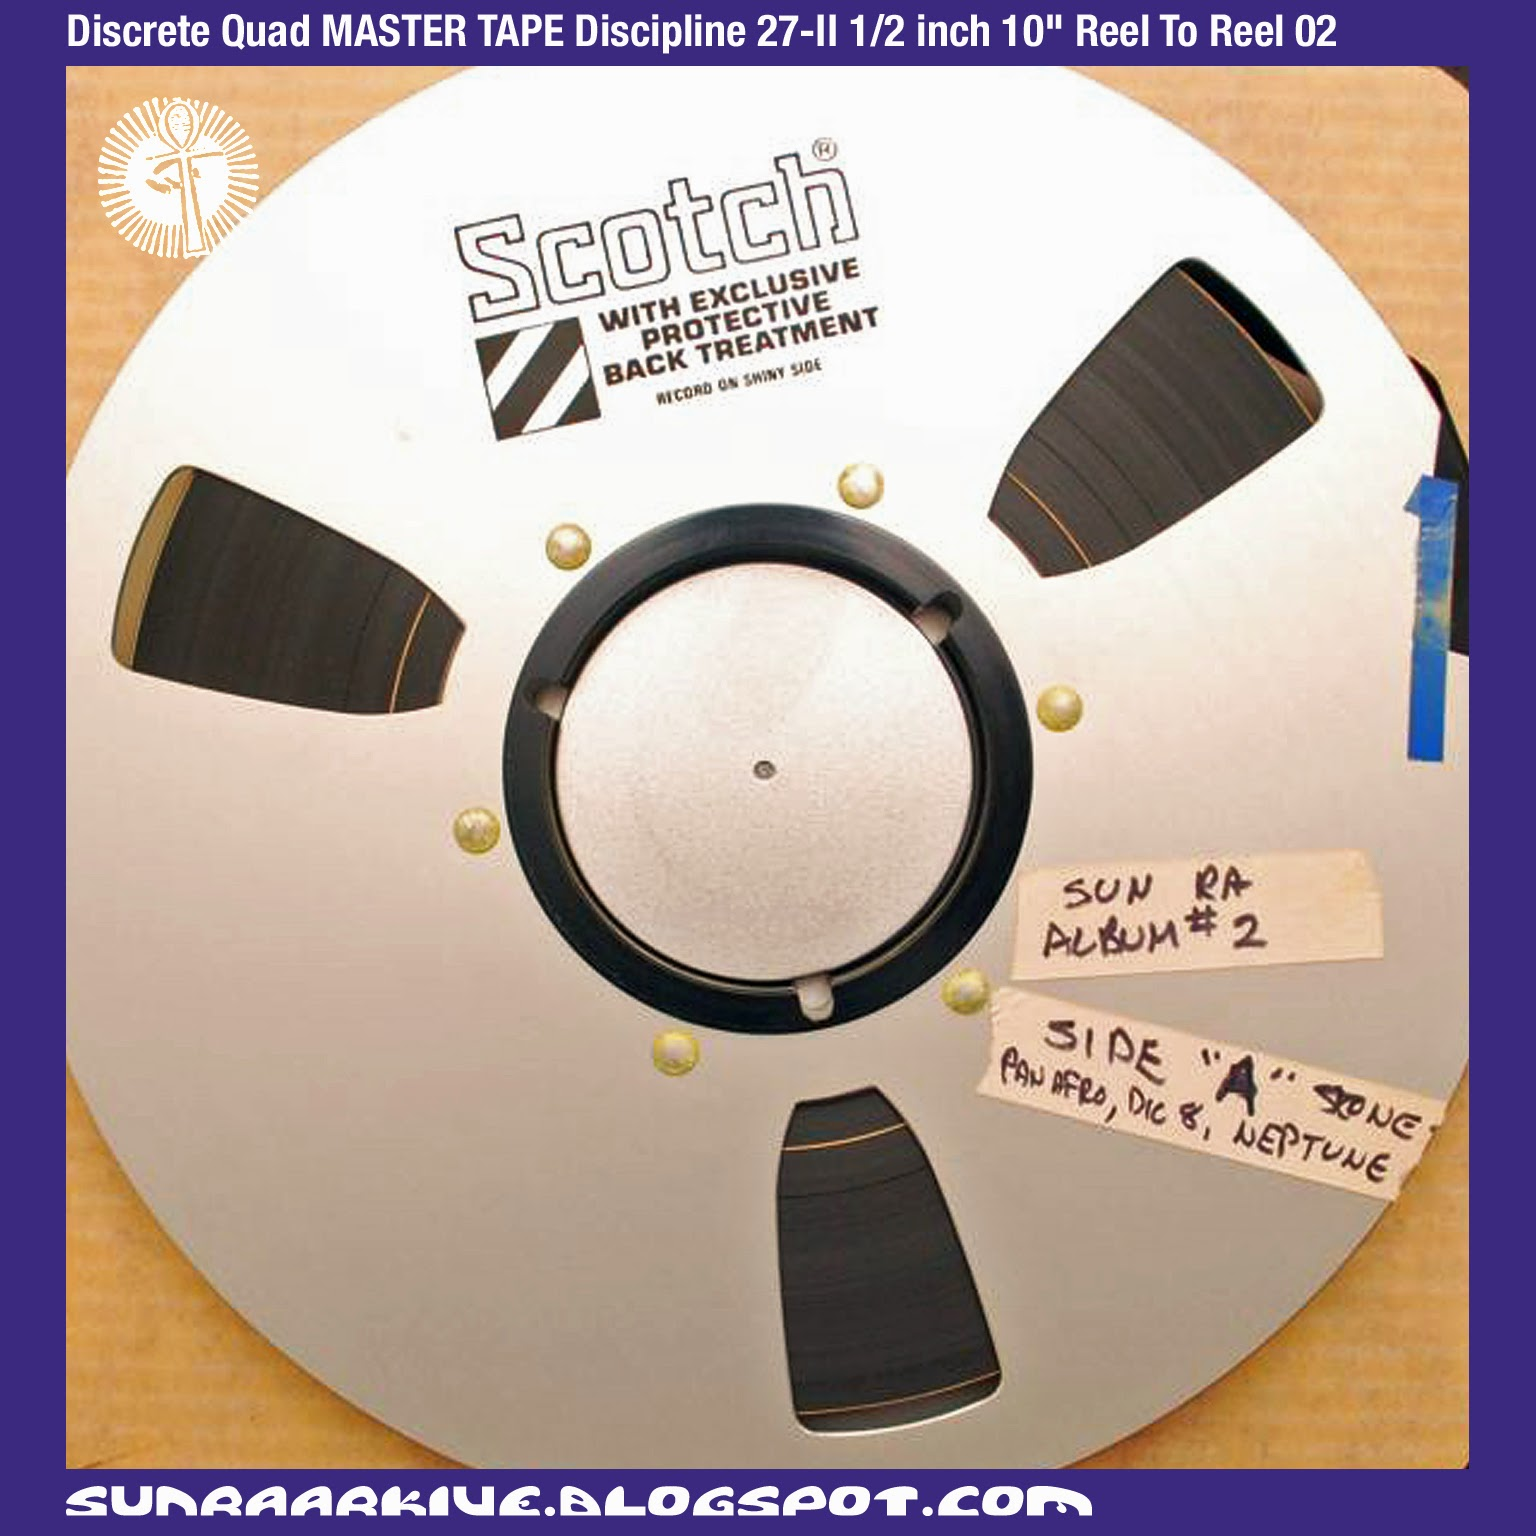 "Sun Ra Arkive: Sun Ra Reel To Reel Master Tapes from Ebay - Discrete Quad MASTER TAPE Discipline 27-II 1/2 inch 10"" Reel To Reel 02"